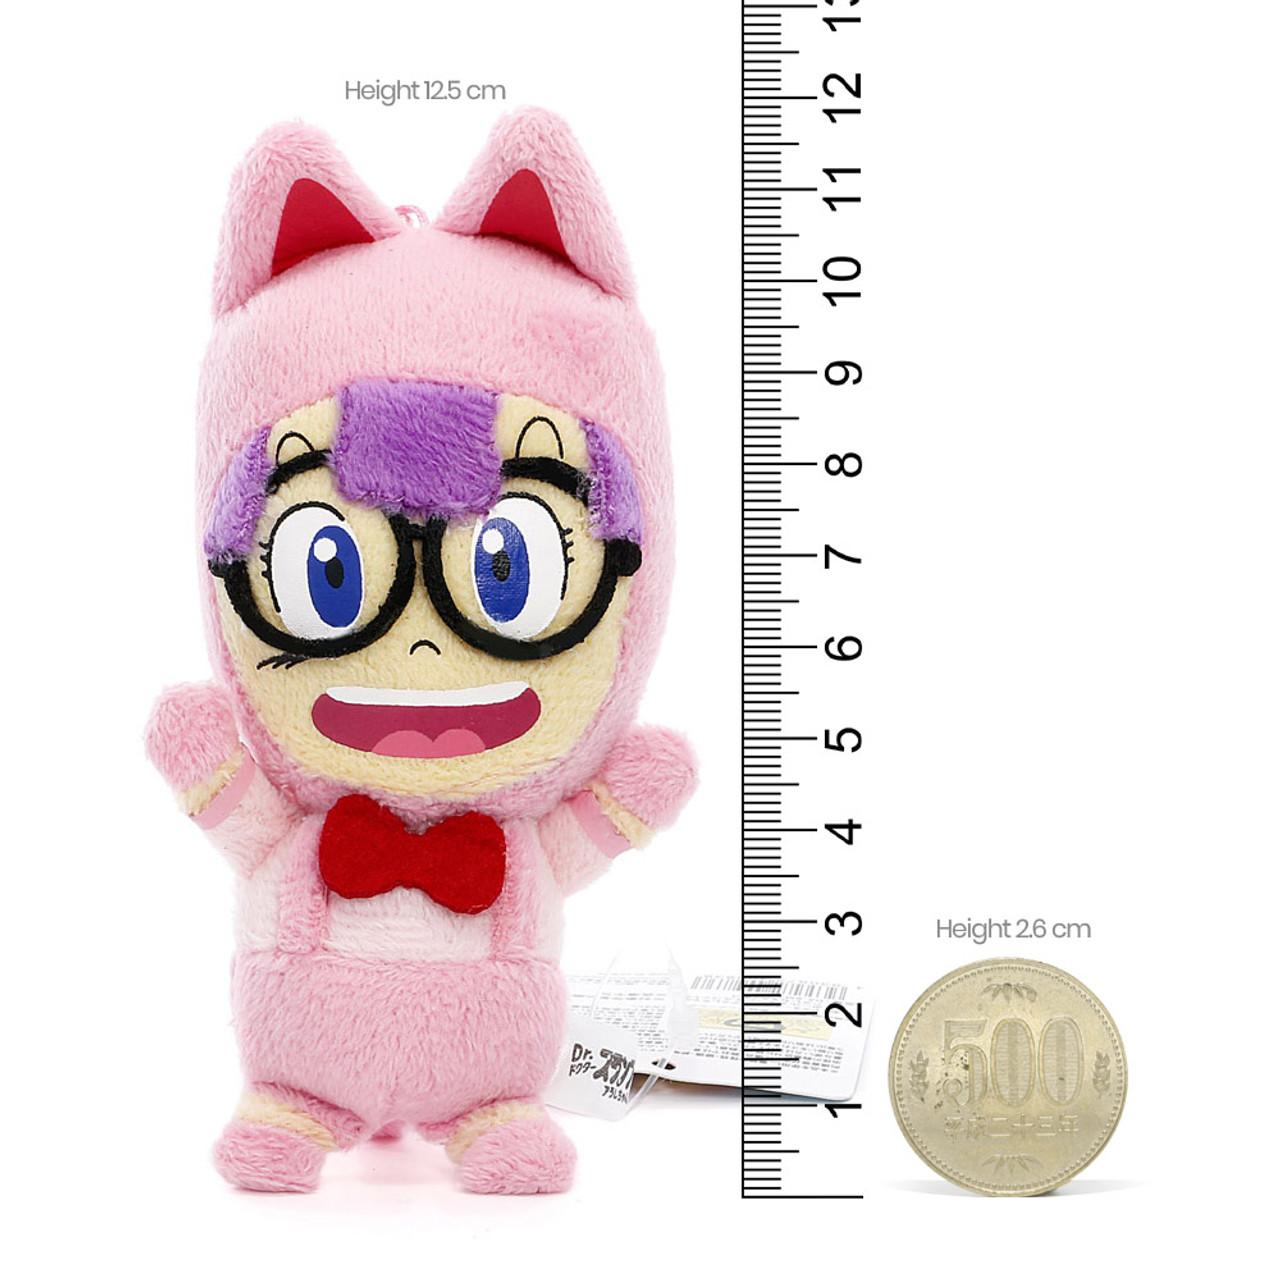 Dr. Slump Arale Norimaki Mascot Plush KeyChain( Proportion )